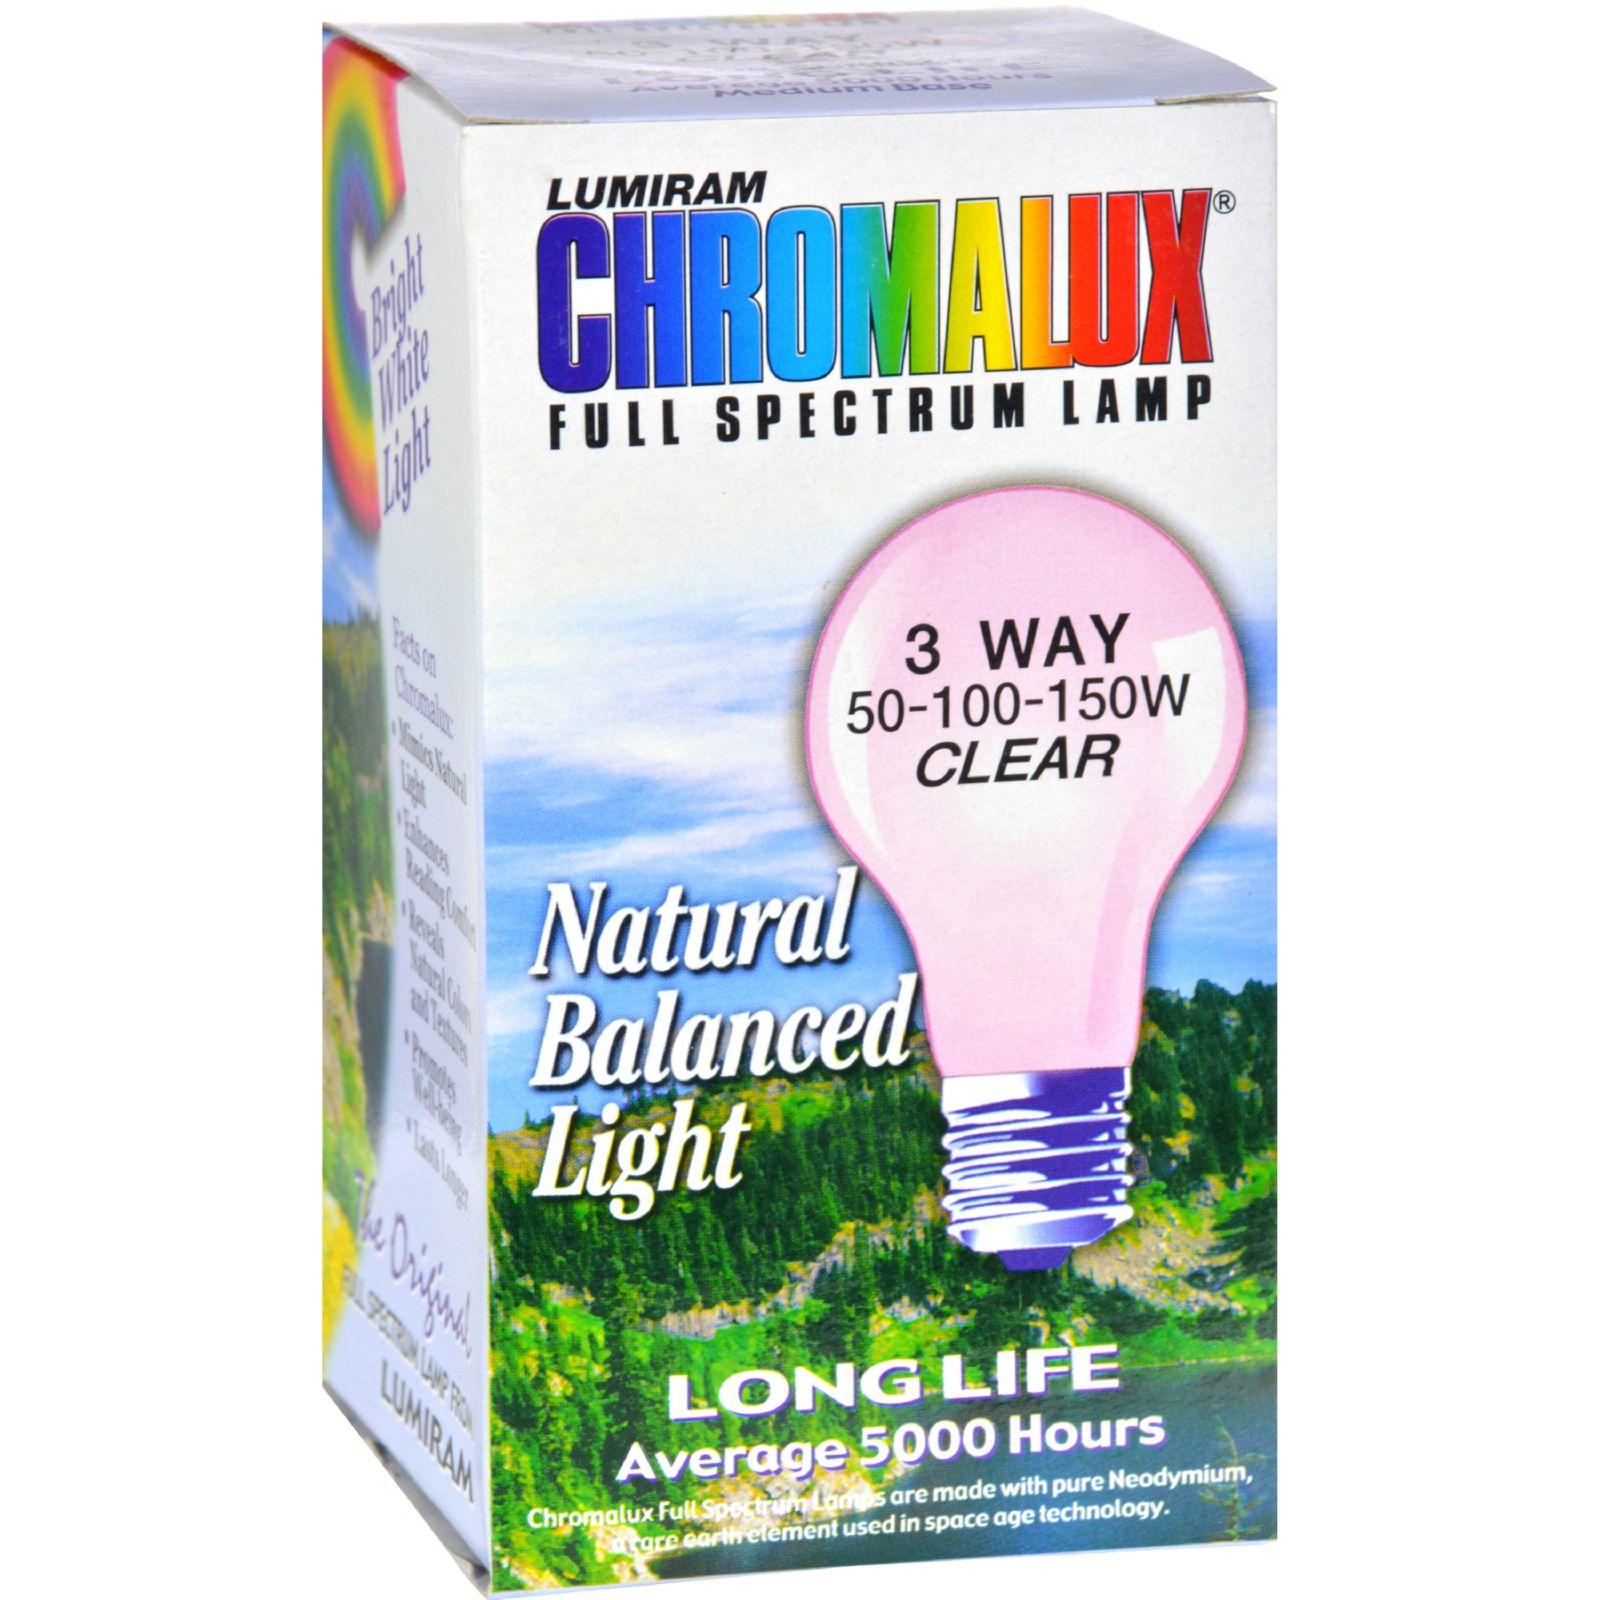 Standard Clear 3 Way Light Bulb - 1 Bulb